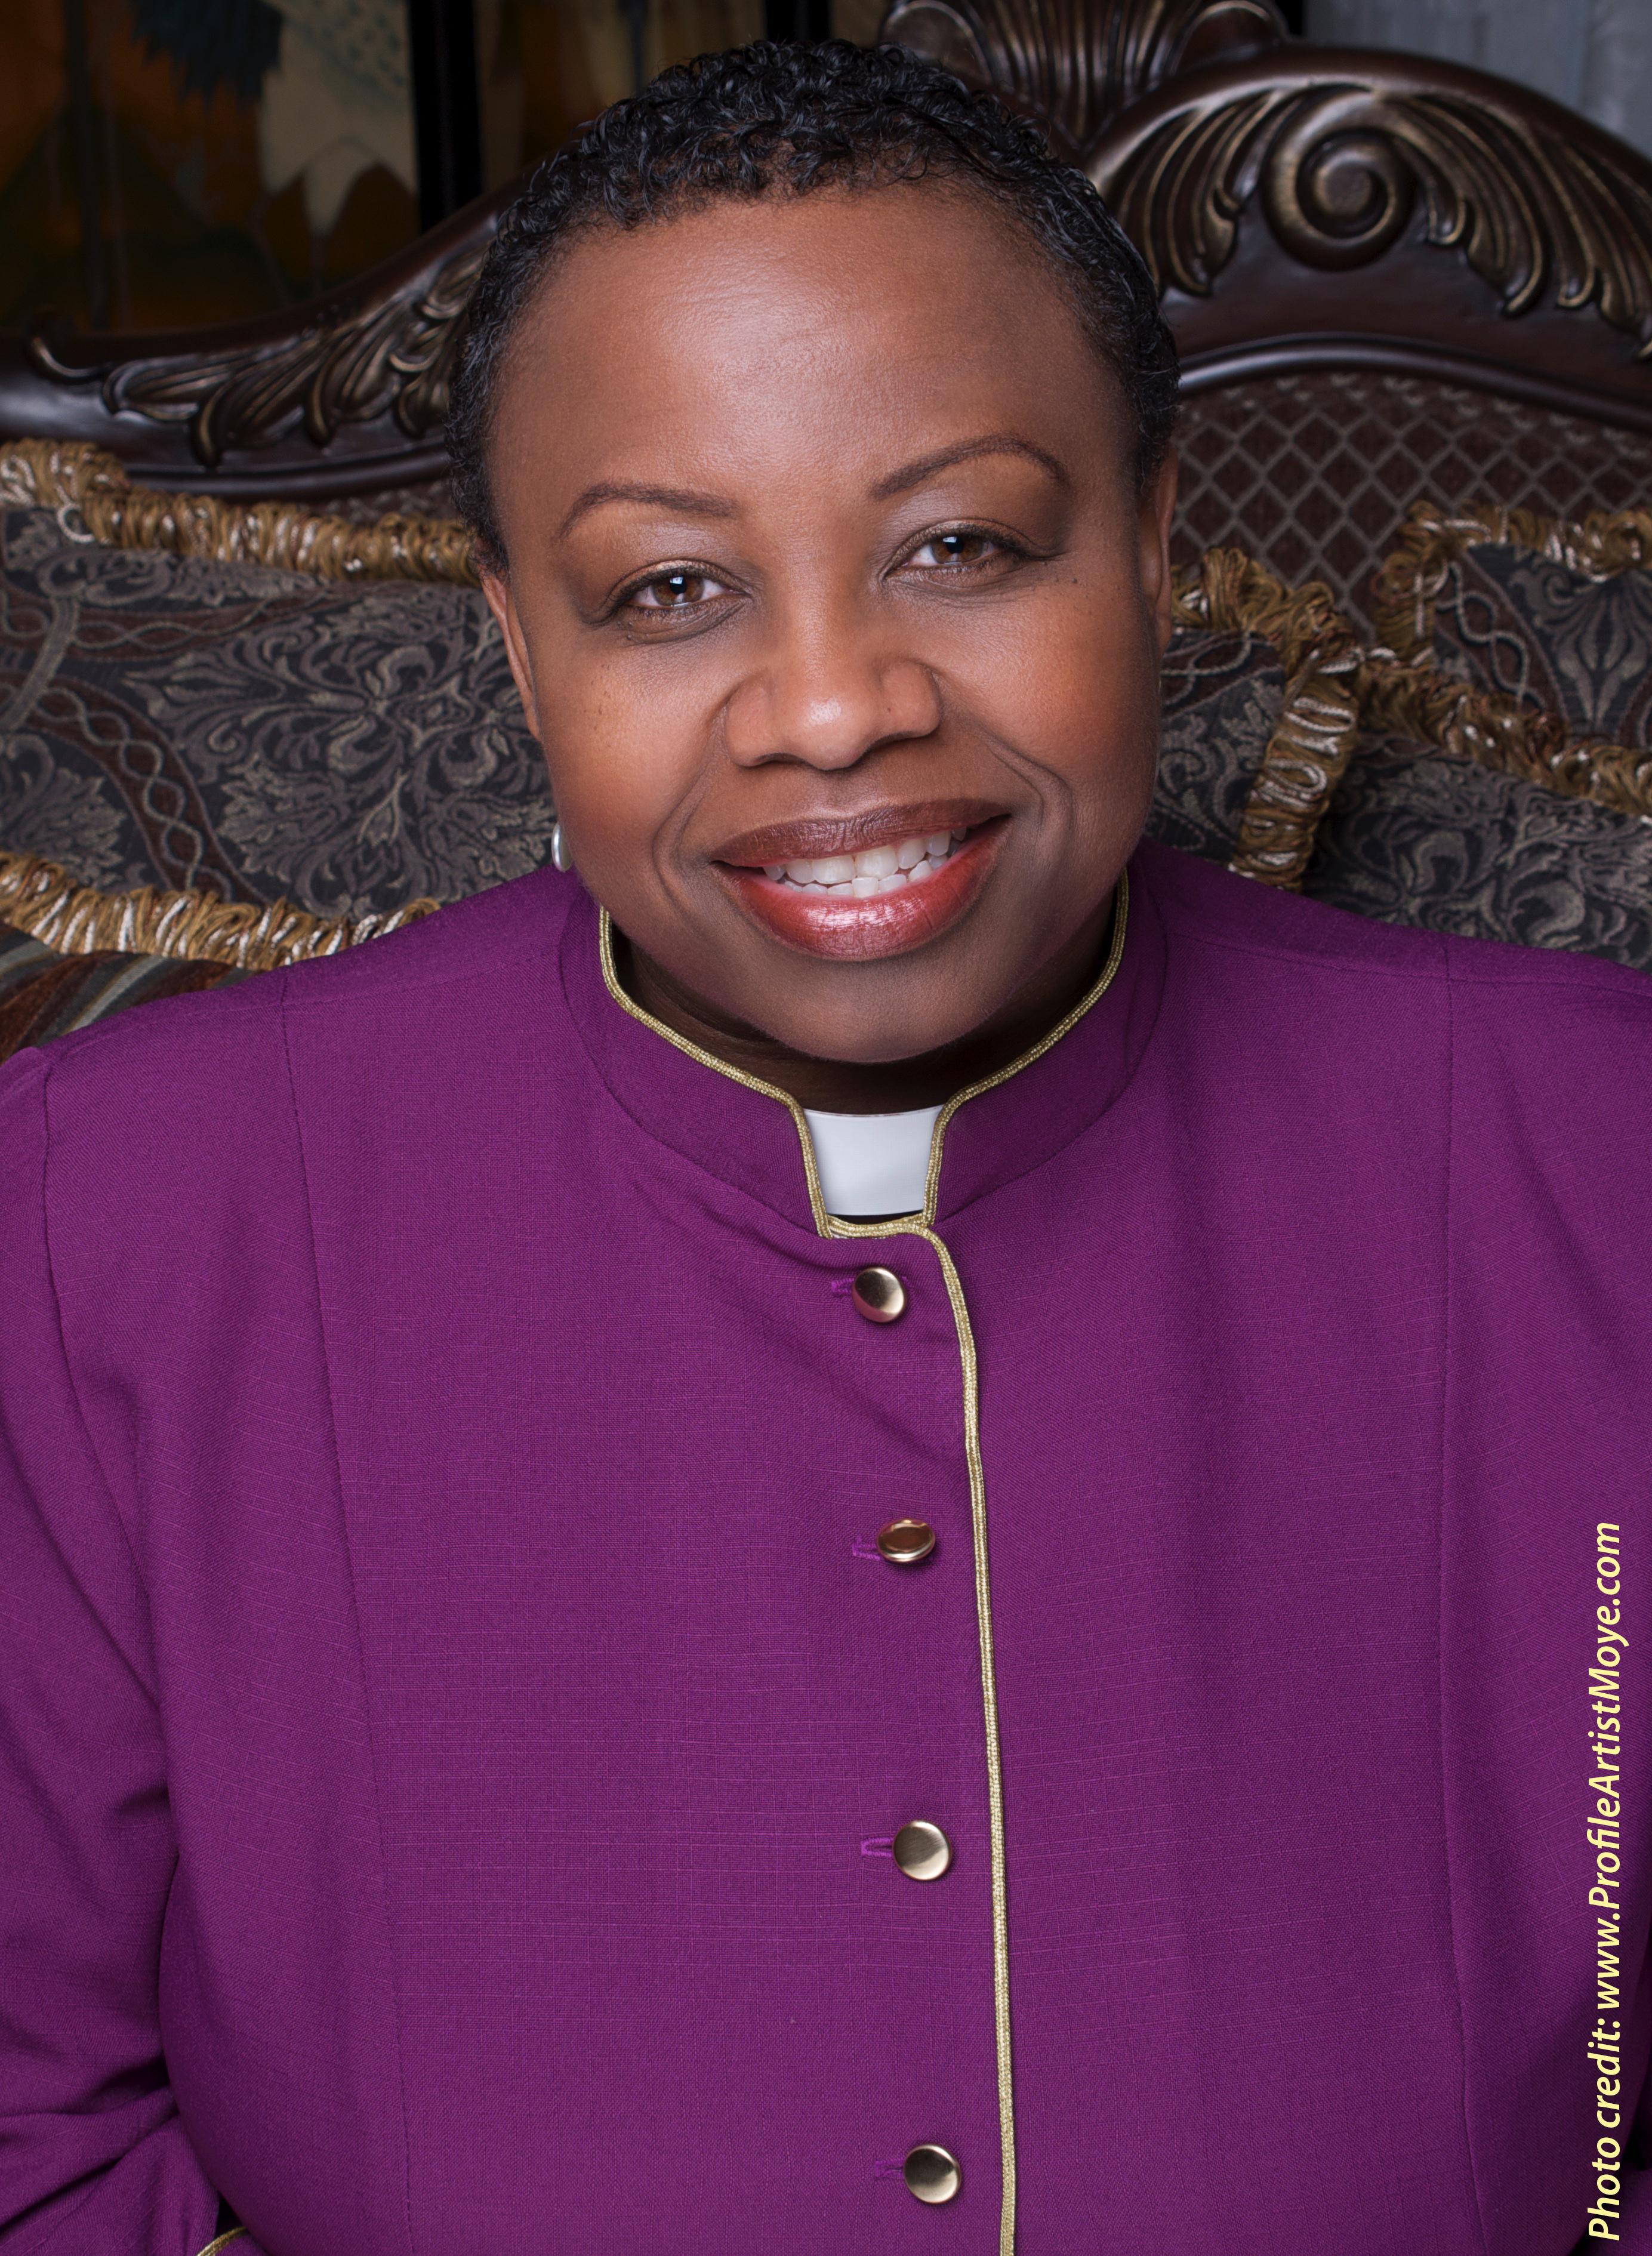 Bishop Tanyia Rawls